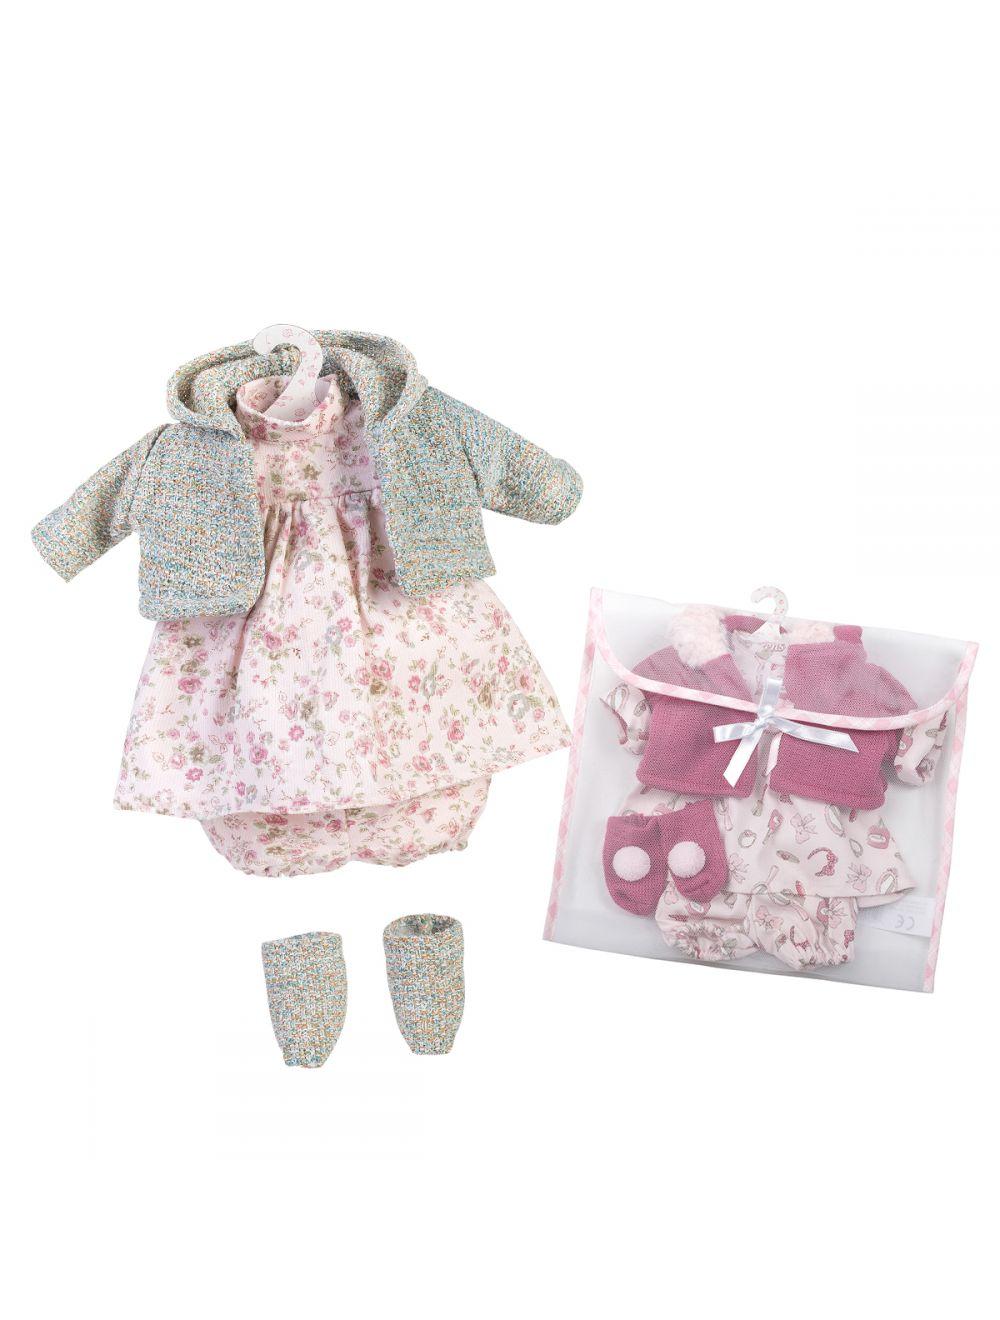 Llorens ubranko dla lalki Martina Tina 40 cm mix wzorów